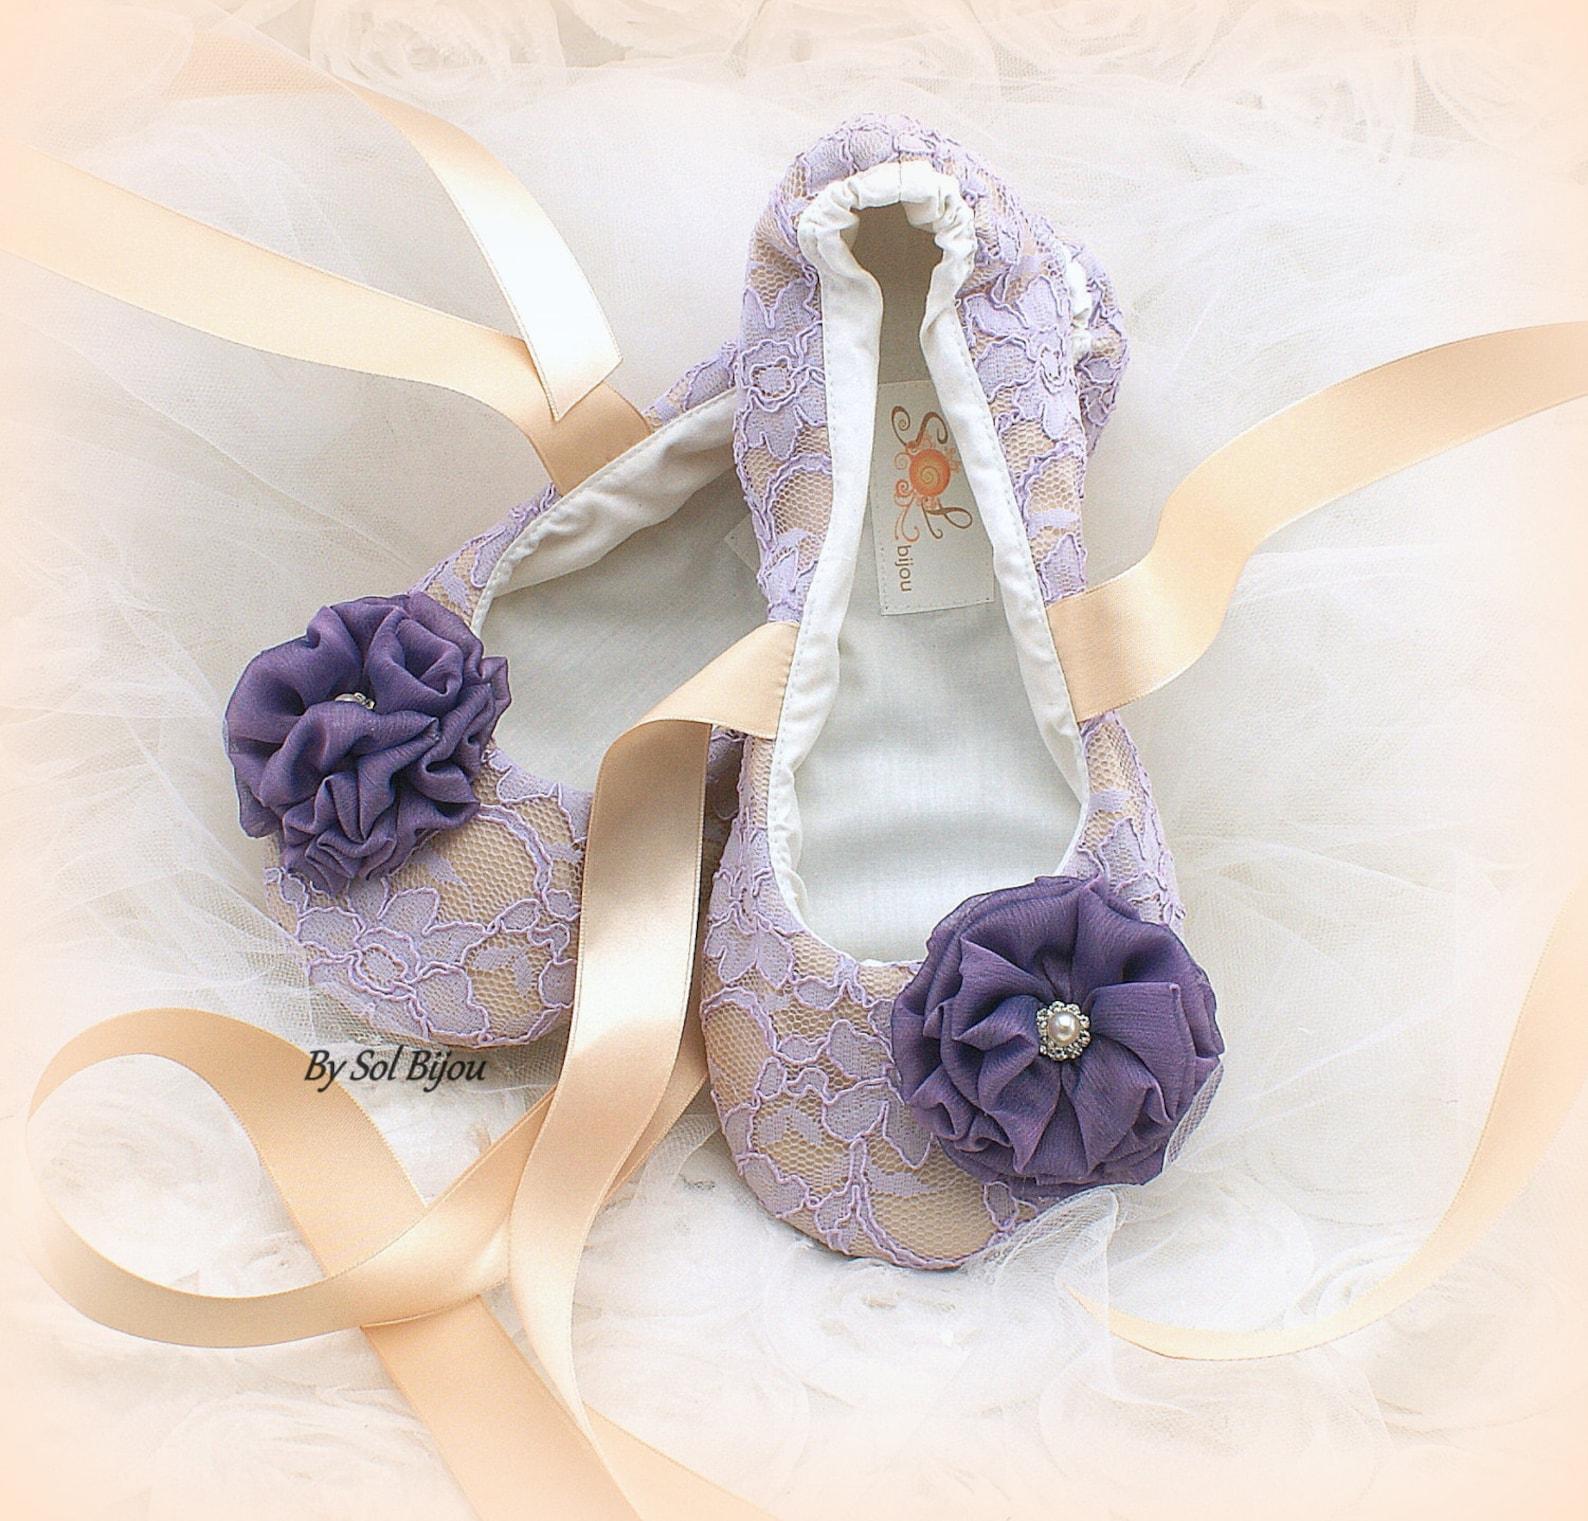 lilac and gold flats, ballet flats, champagne, purple, wedding flats, lace ballet flats, ballet slippers, elegant wedding, vinta